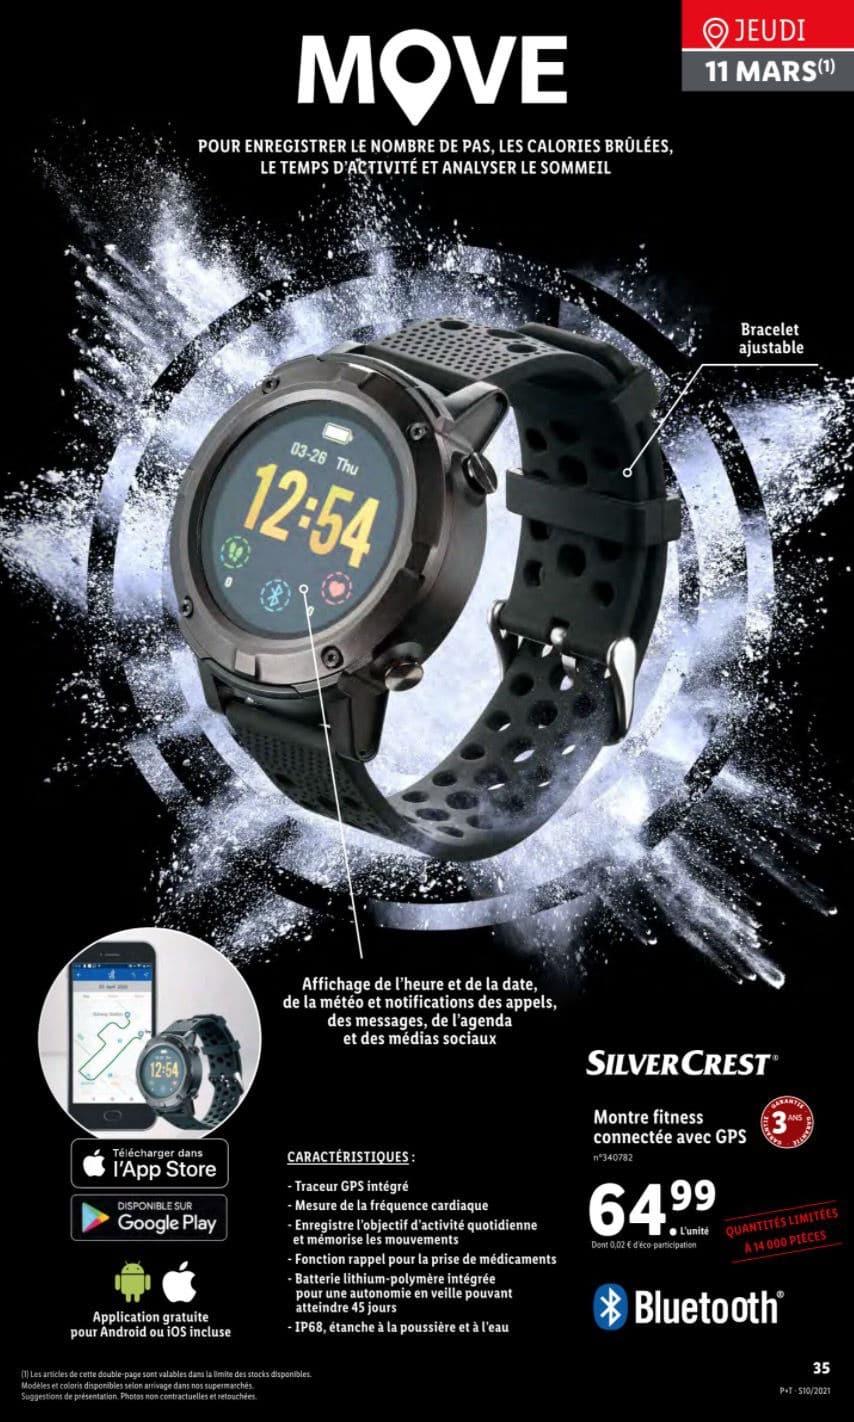 lidl-montre-connectee-GPS